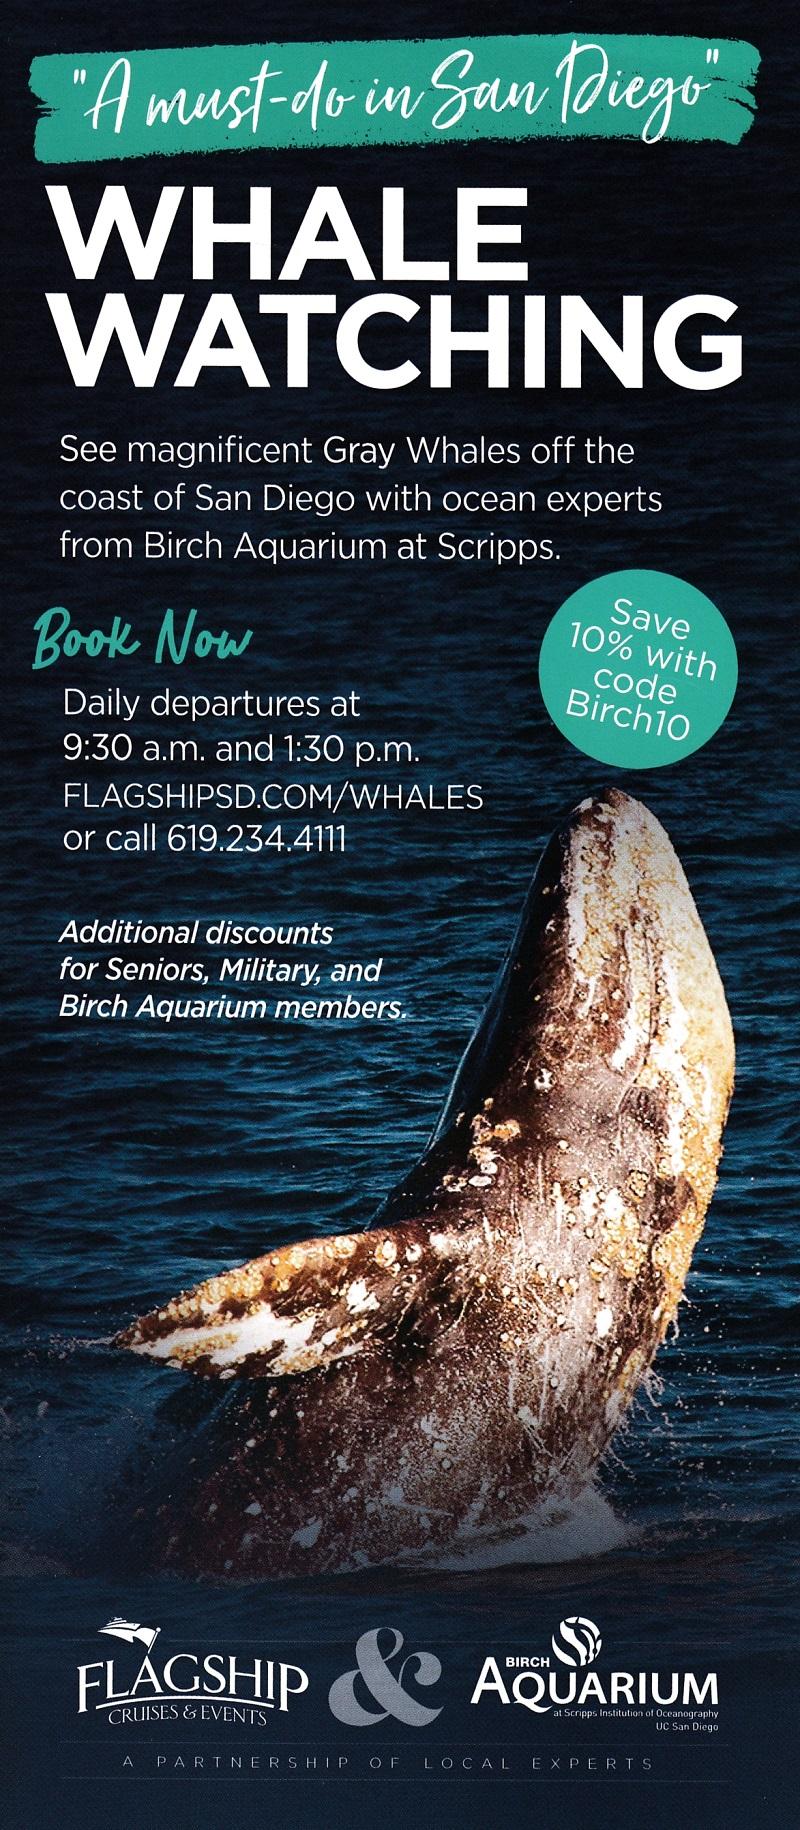 Birch Aquarium - Whale Watch